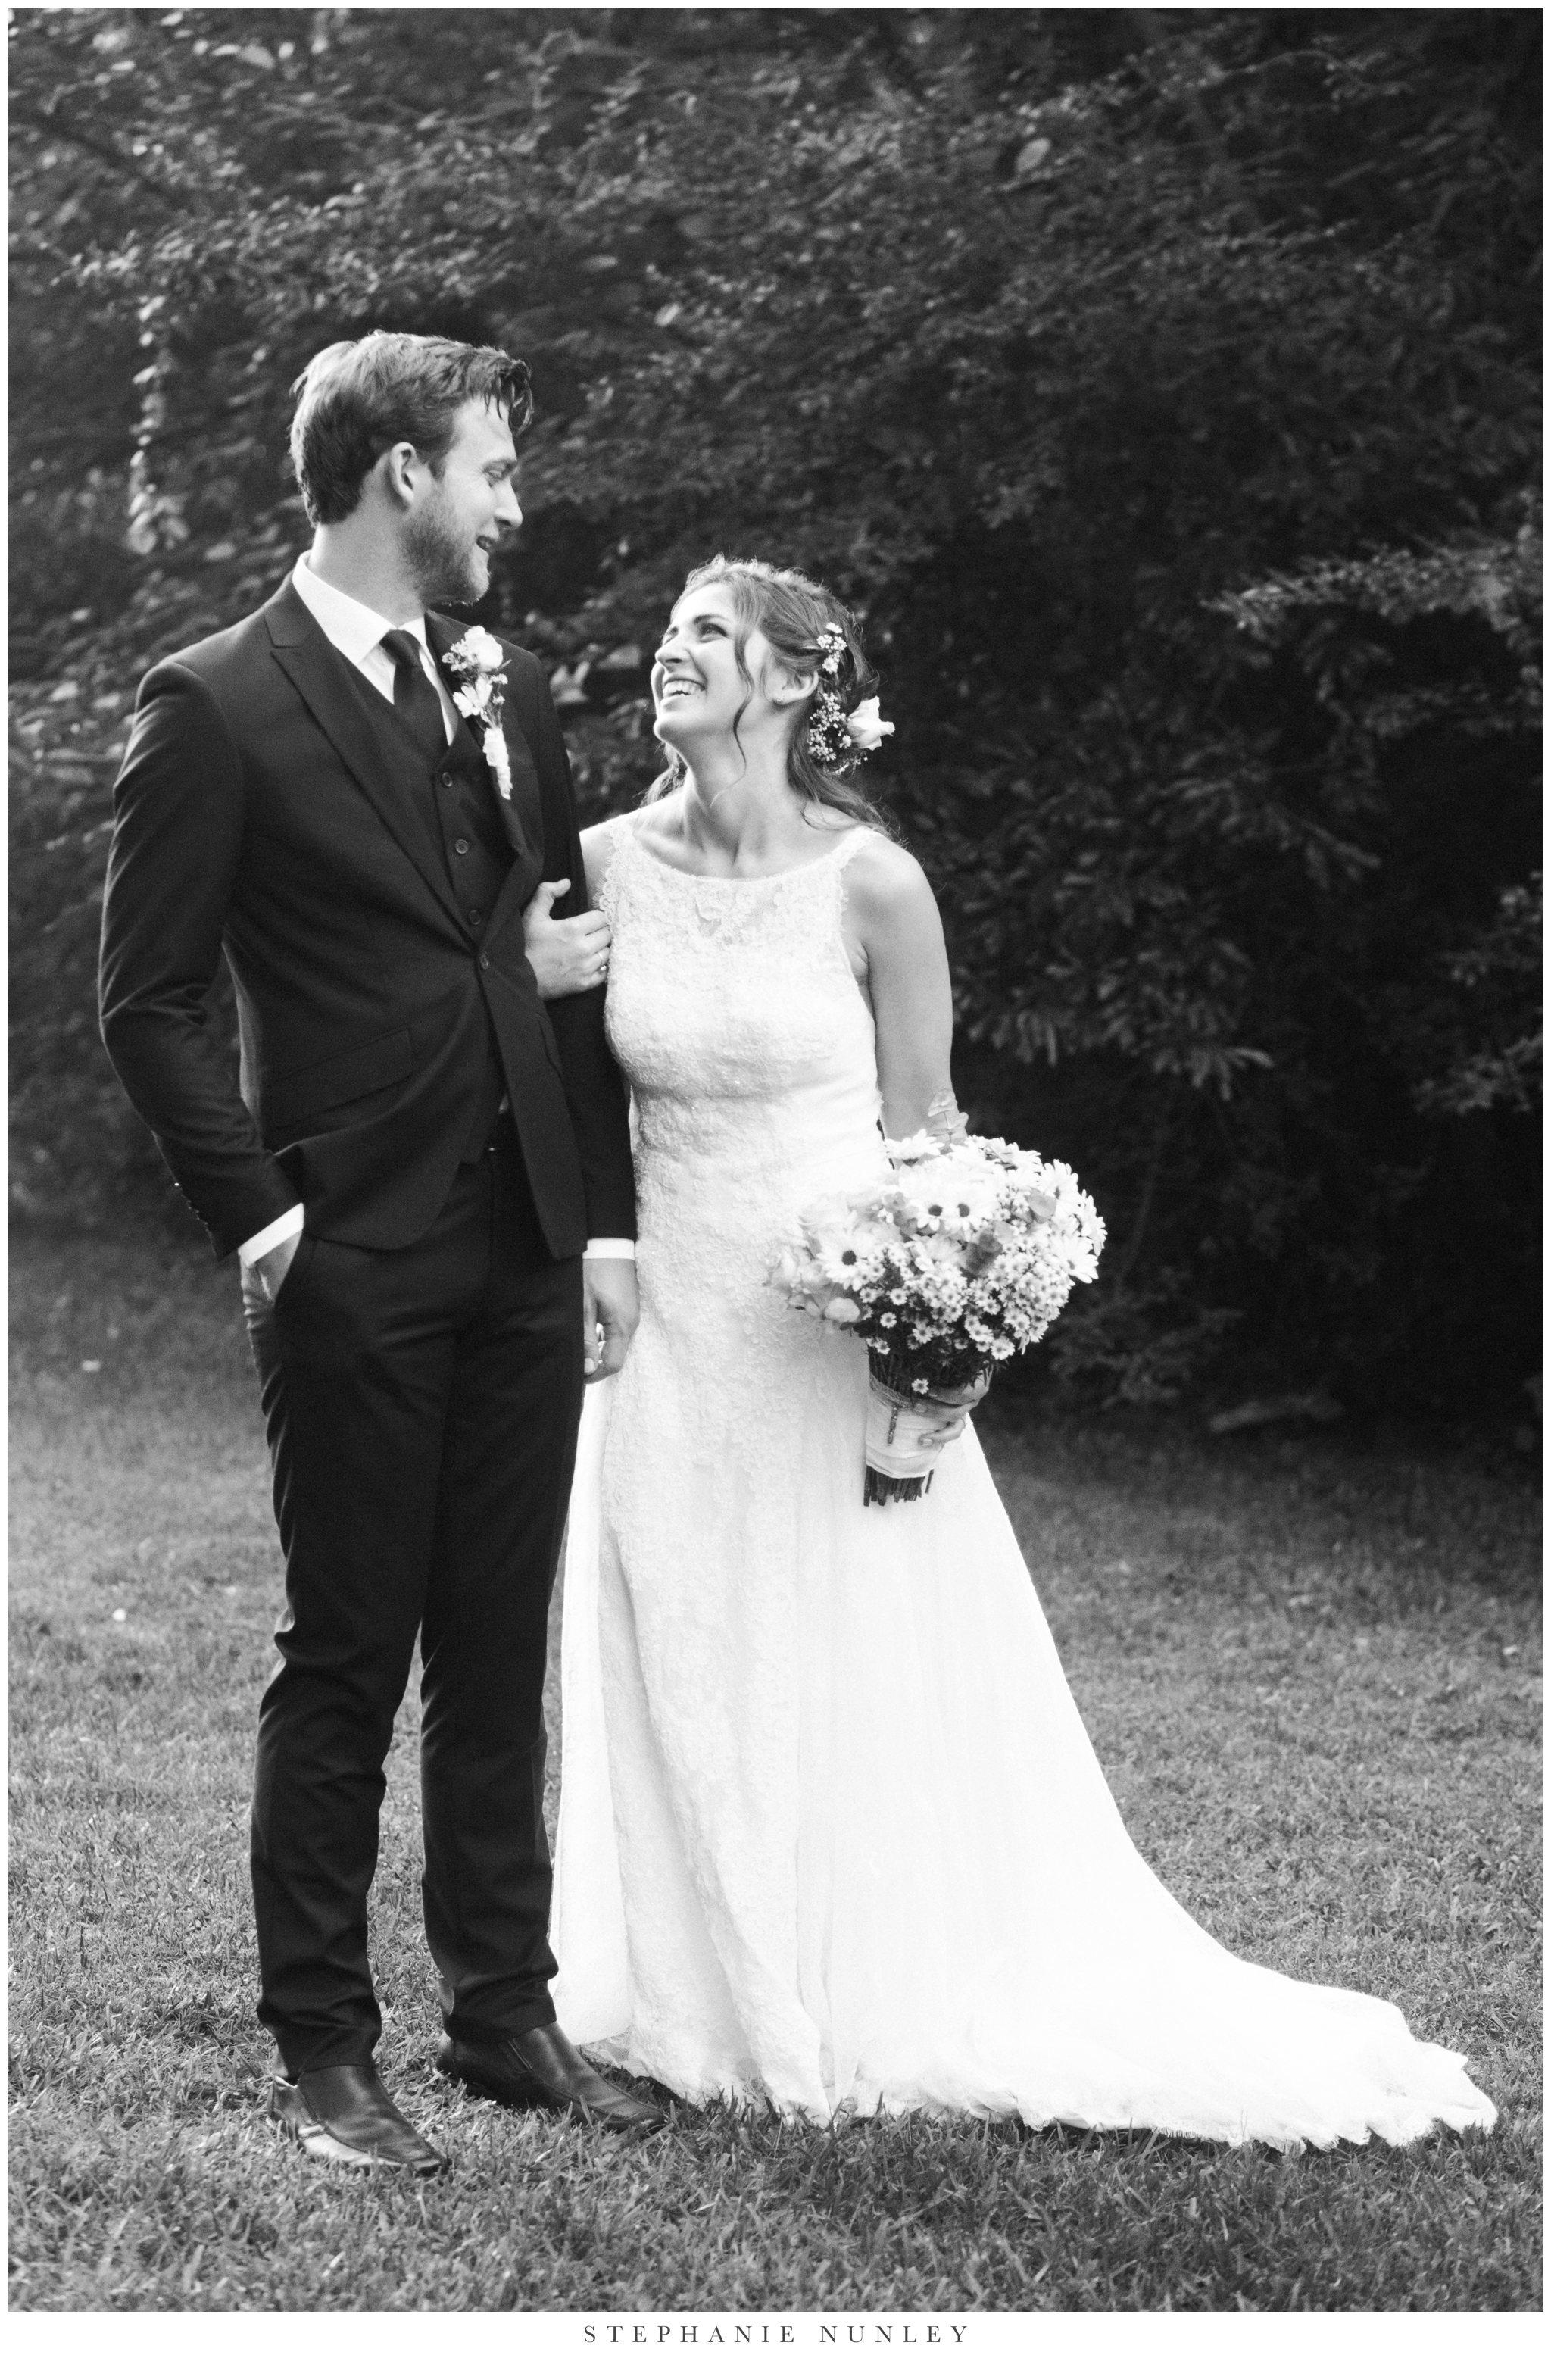 classic-elegant-backyard-wedding-photos-0037.jpg